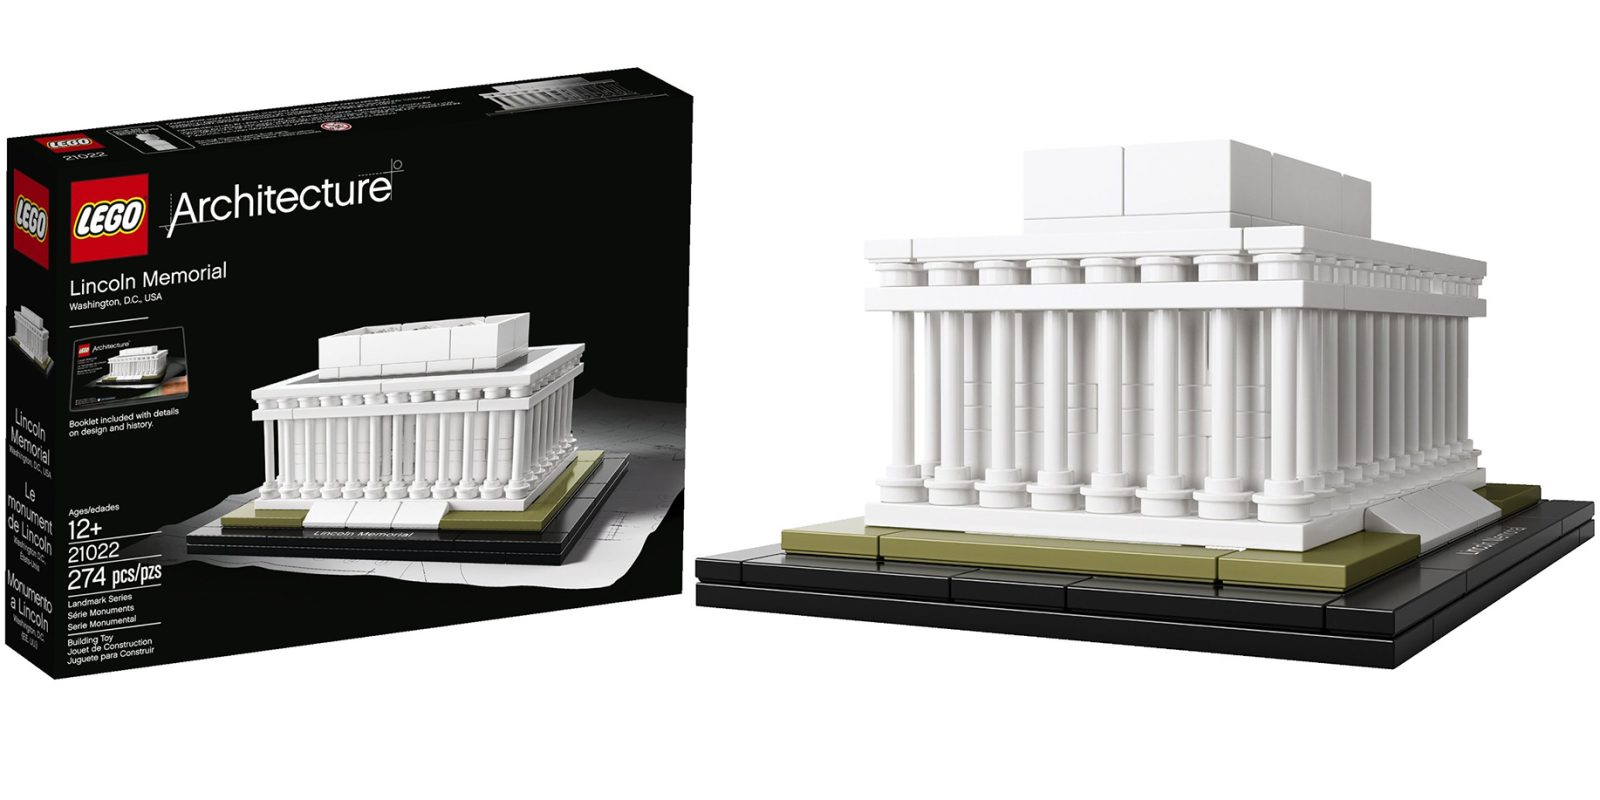 Lego Architecture Lincoln Memorial Model Kit 21022 21 Prime